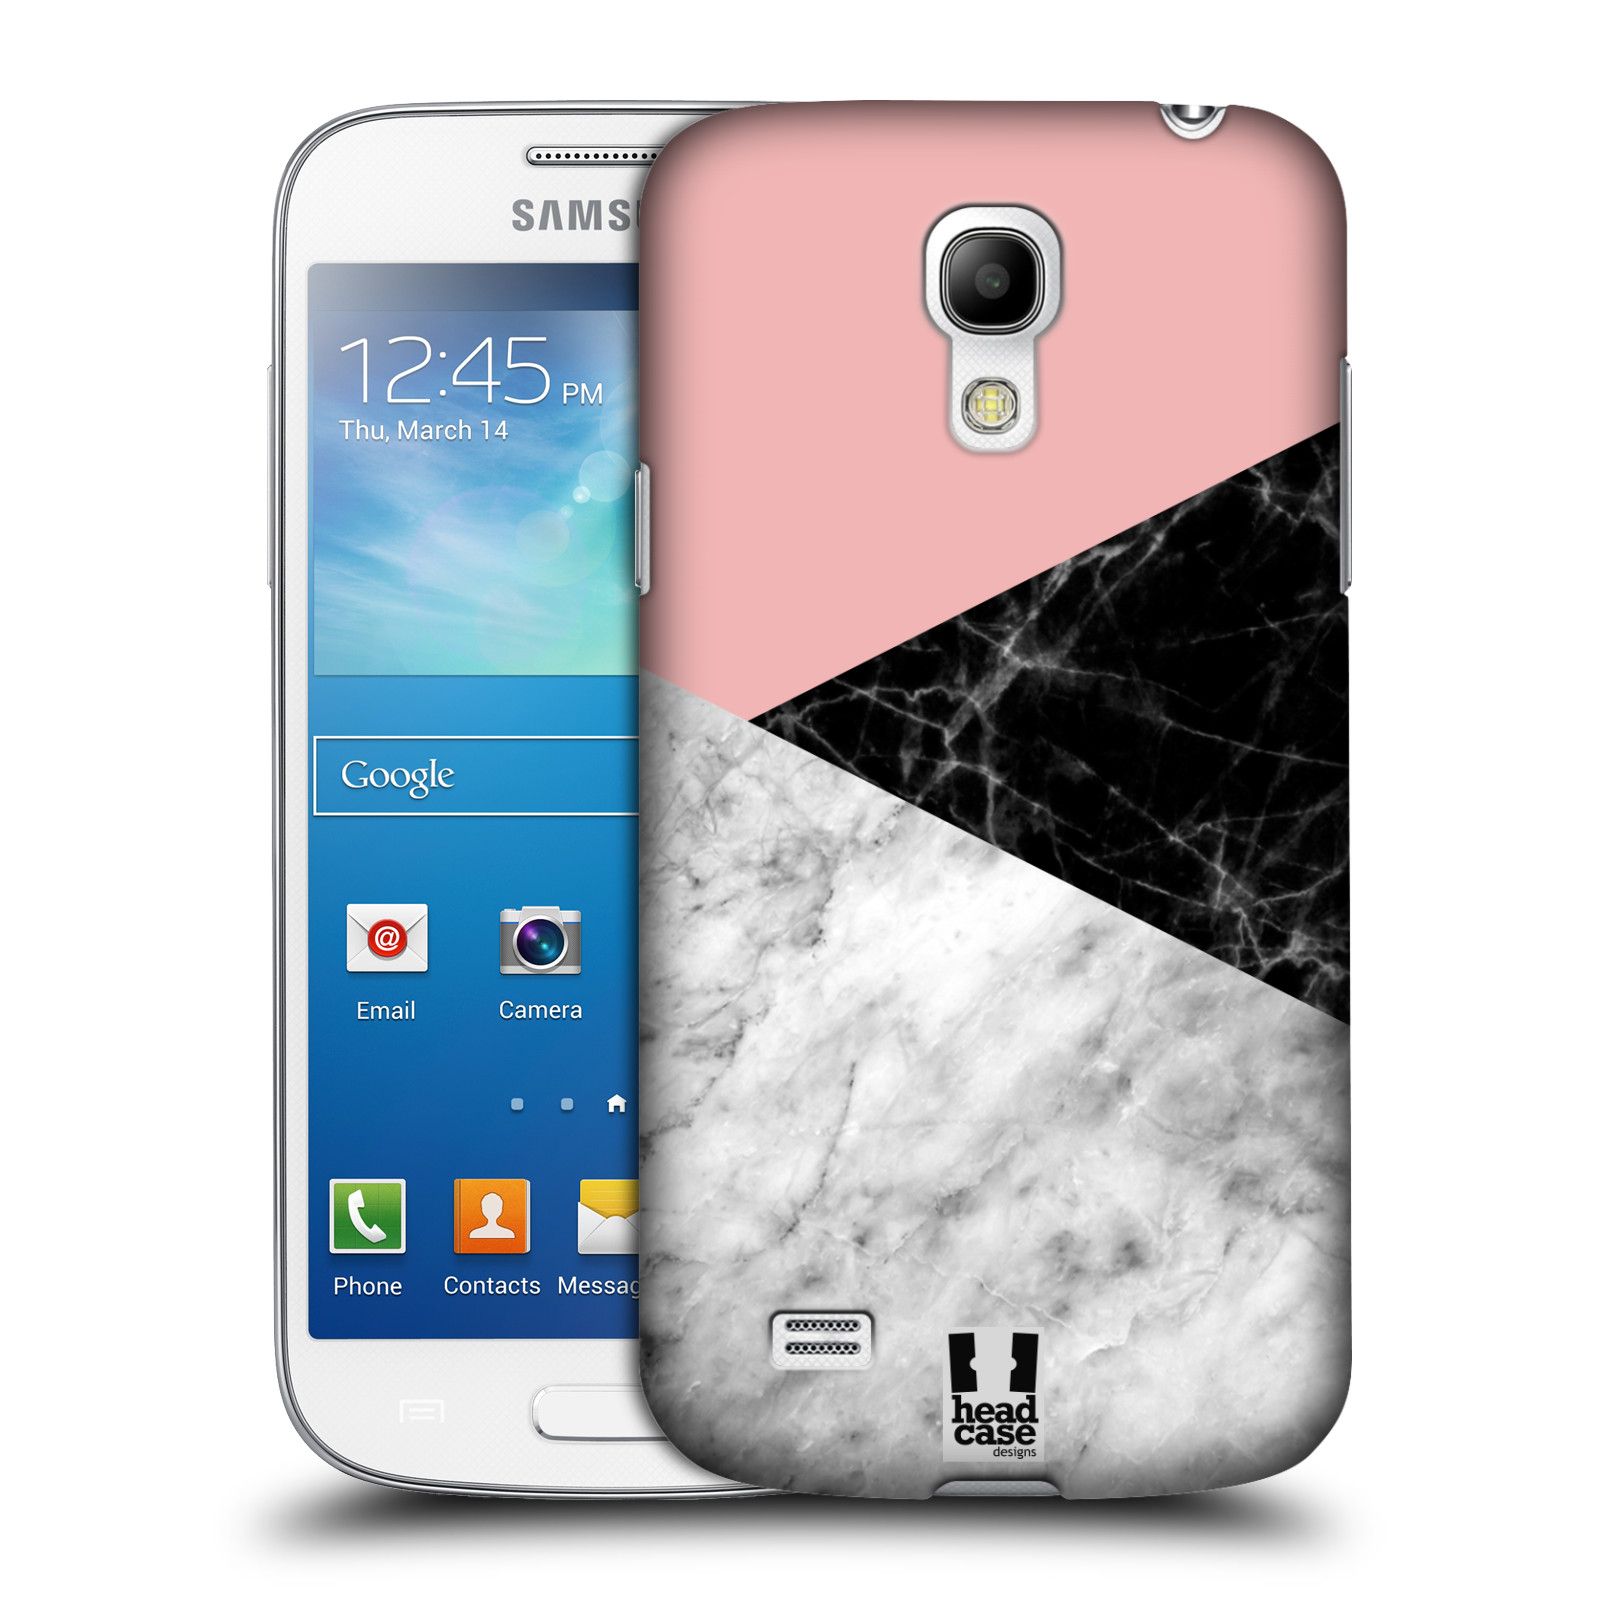 Plastové pouzdro na mobil Samsung Galaxy S4 Mini - Head Case - Mramor mix (Plastový kryt či obal na mobilní telefon s motivem Mramor mix pro Samsung Galaxy S4 Mini GT-i9195 / i9190)